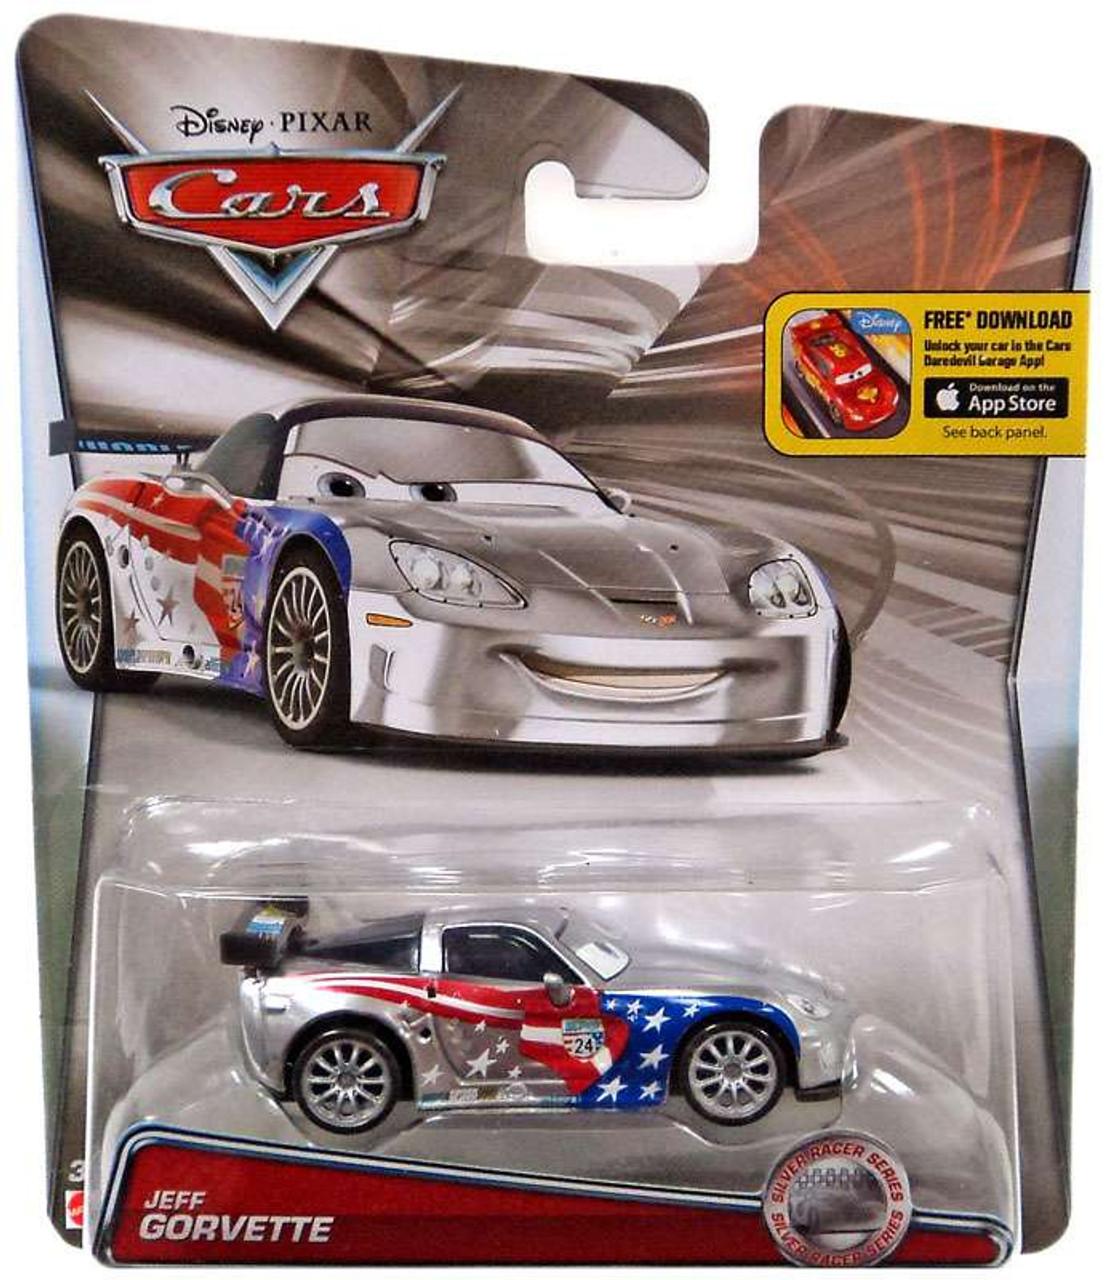 Disney Pixar Cars Silver Racer Series Jeff Gorvette 155 Diecast Car